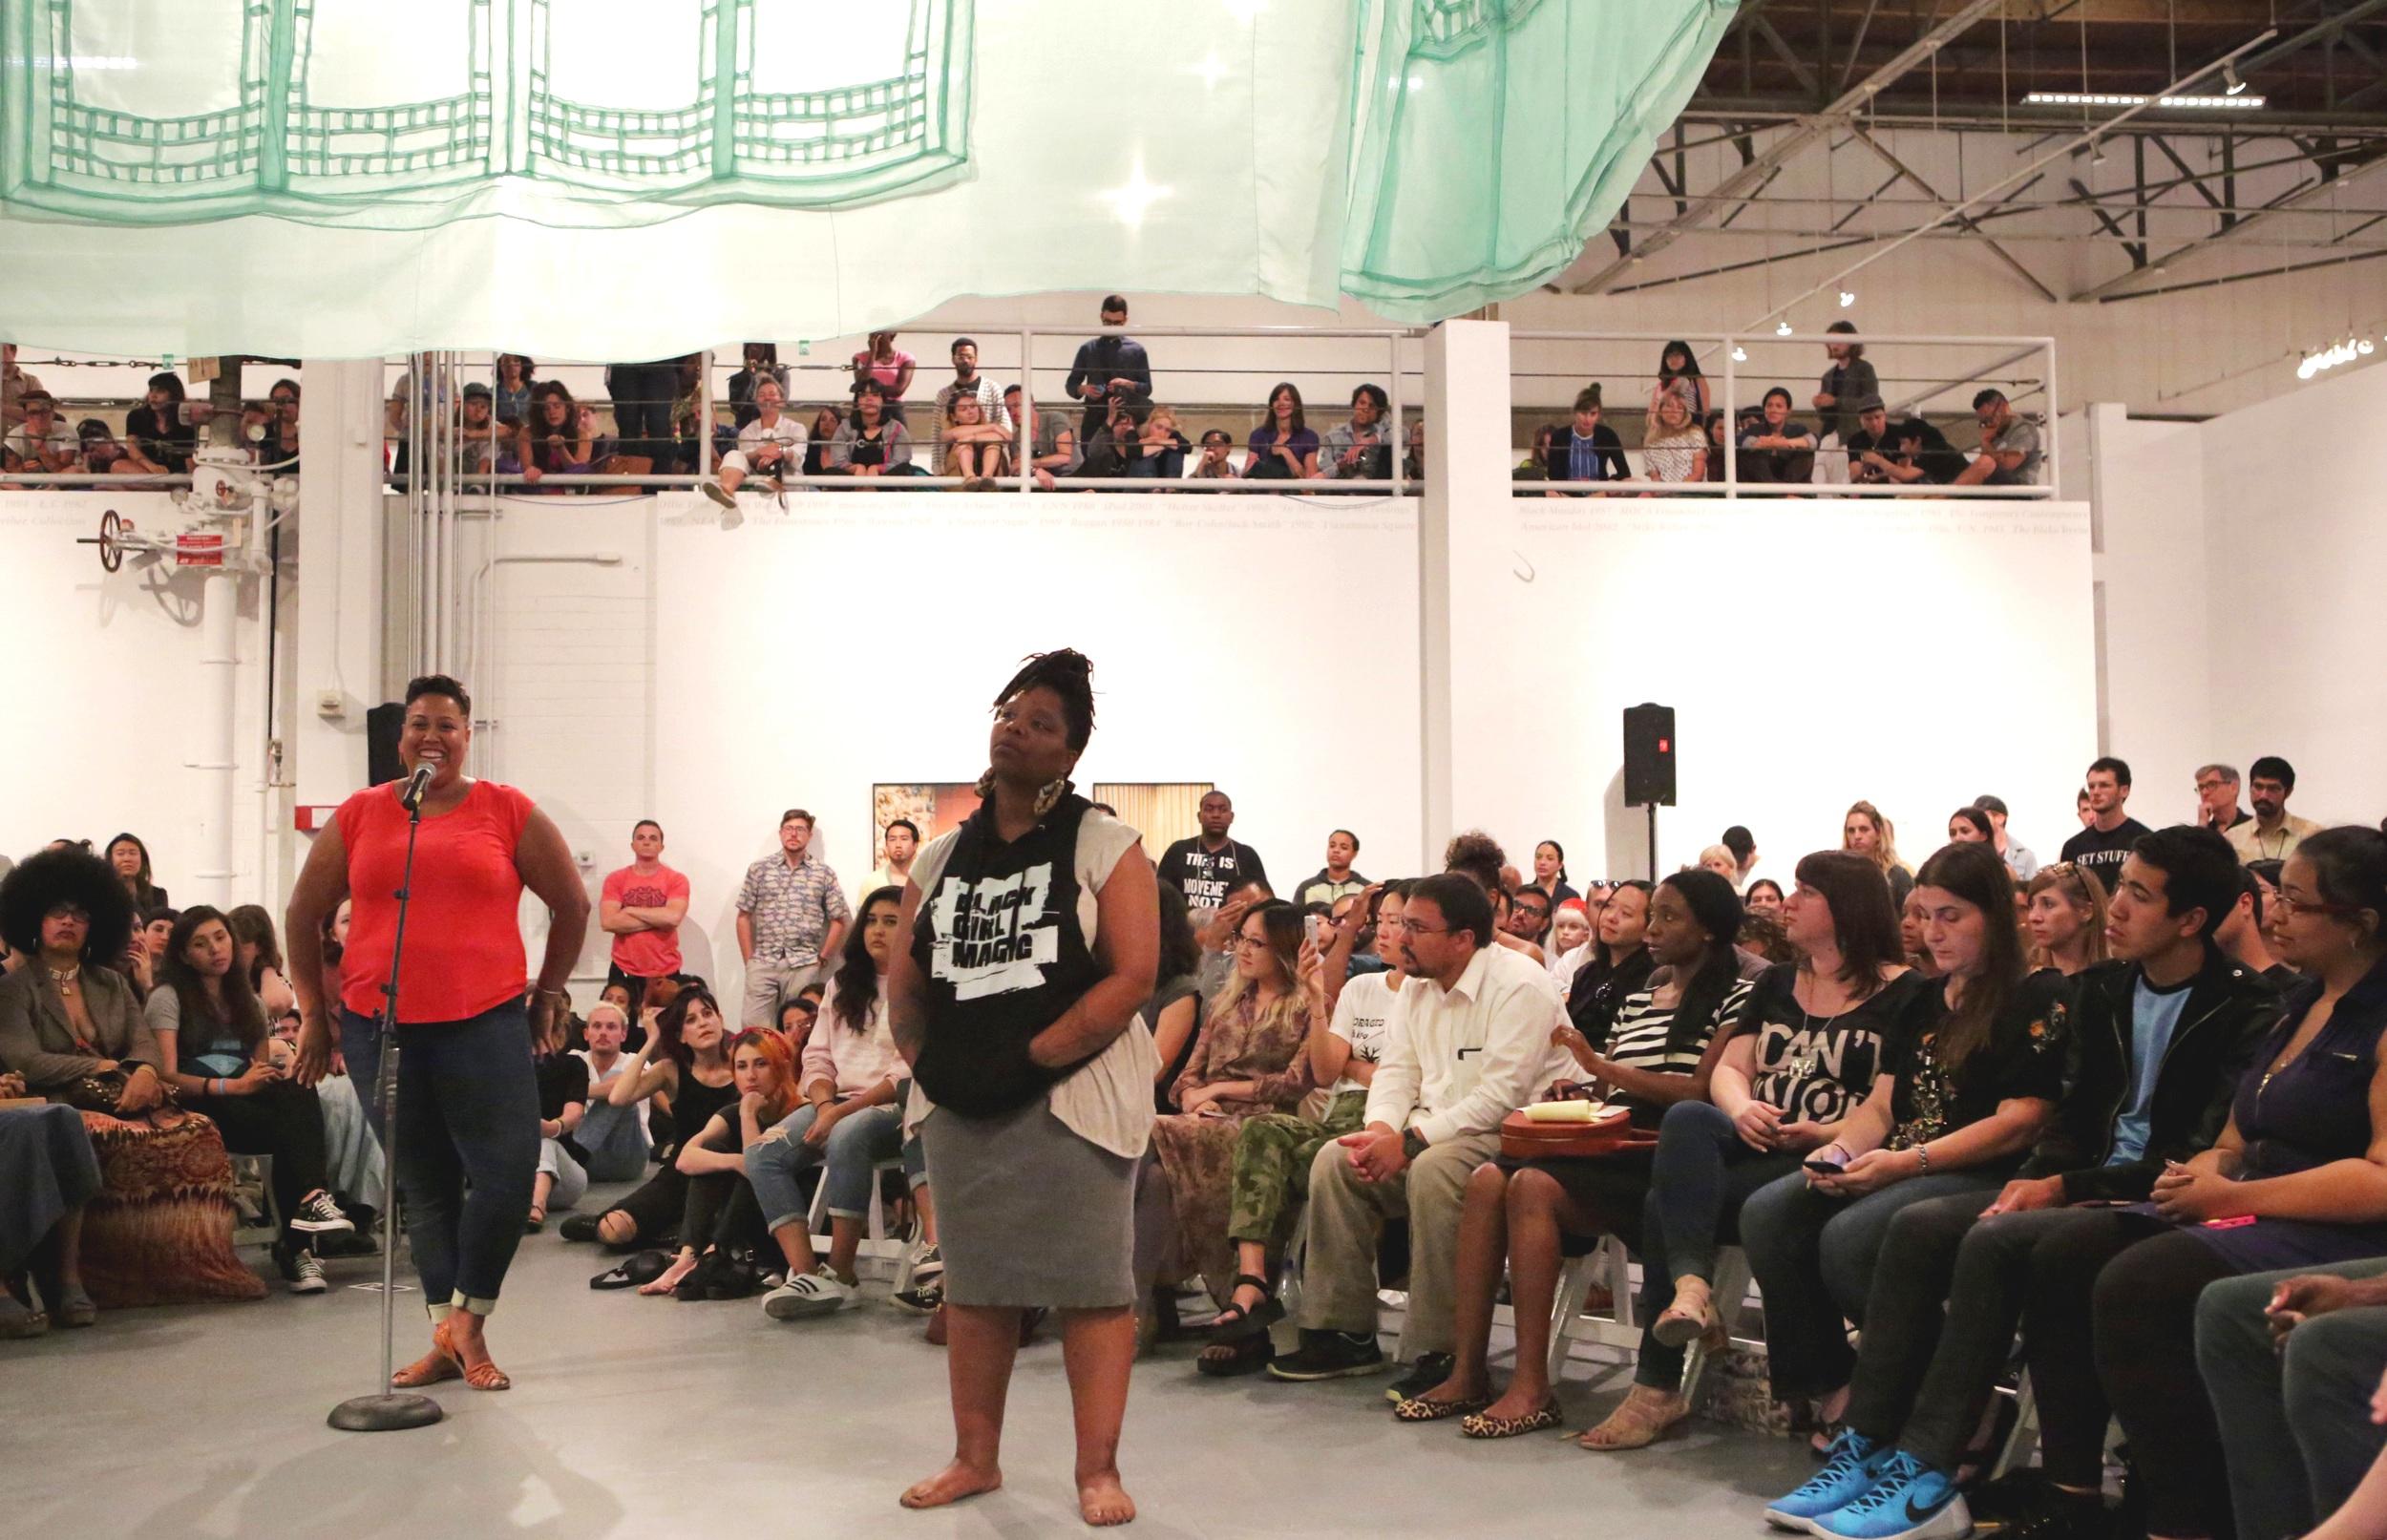 Black Lives Matter: Patrisse Cullors and Tanya Lucia Bernard